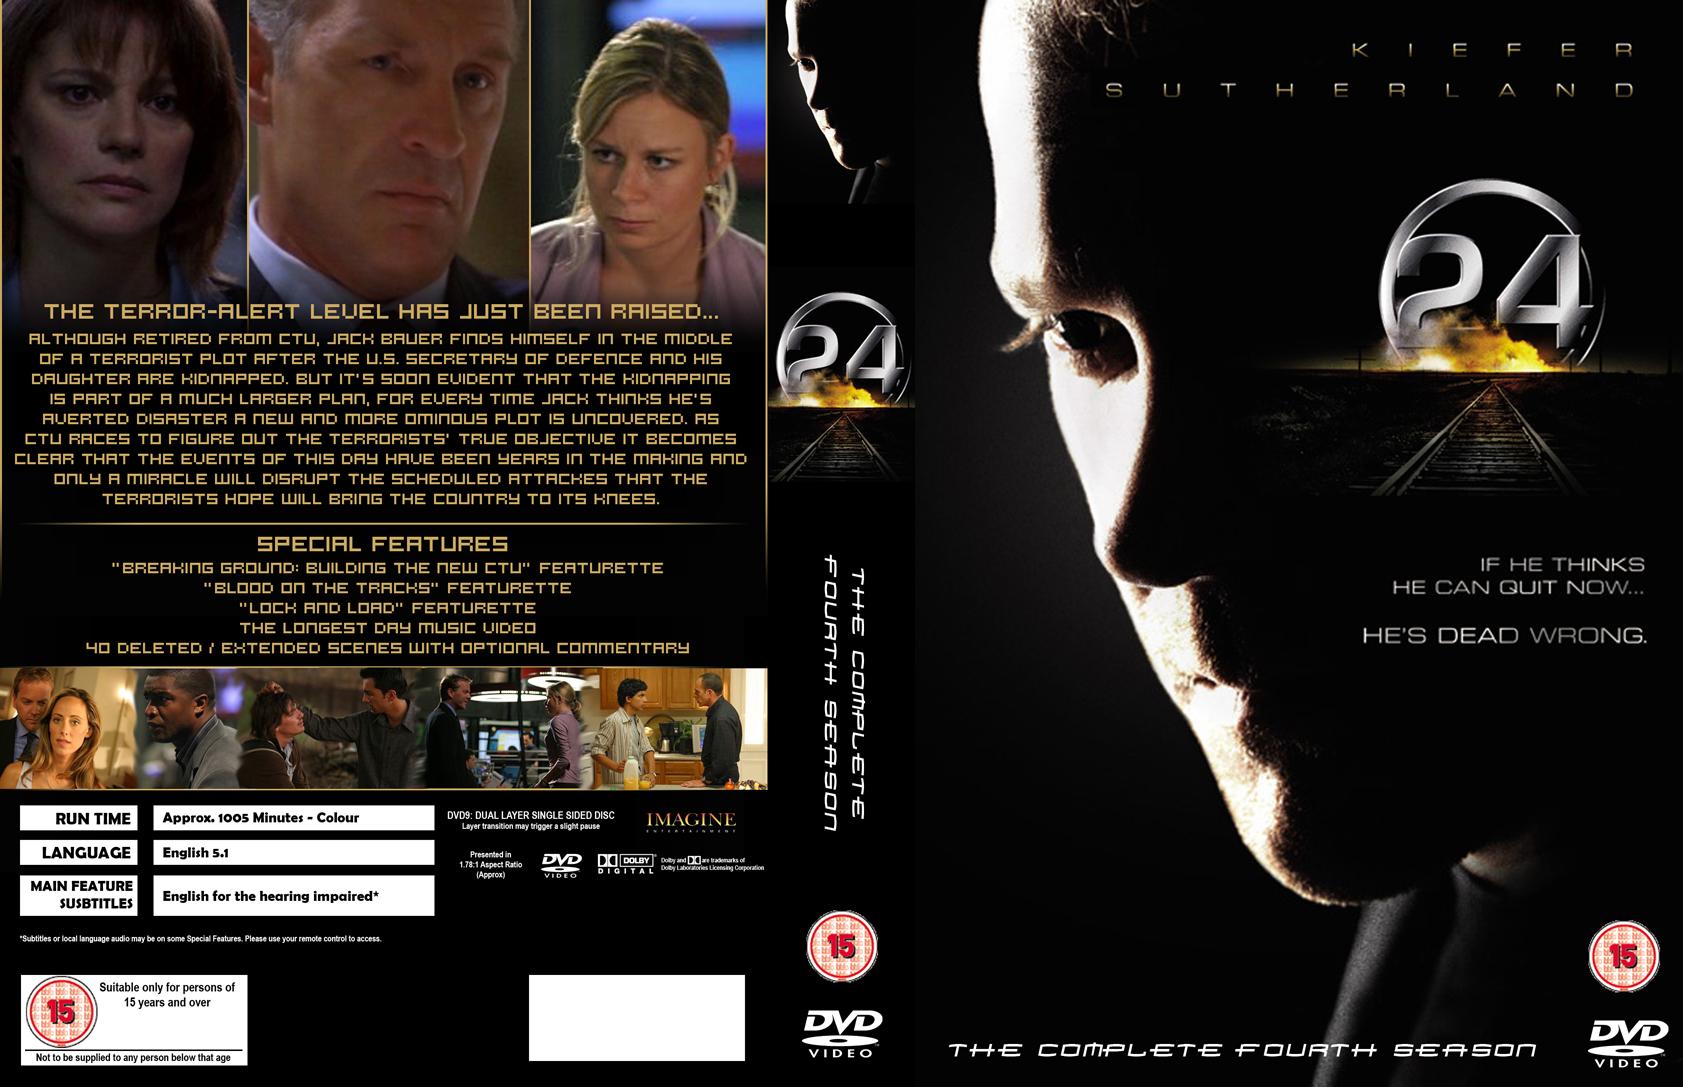 24 season 4 dvd cover spread kelvin lam creative media portfolio. Black Bedroom Furniture Sets. Home Design Ideas